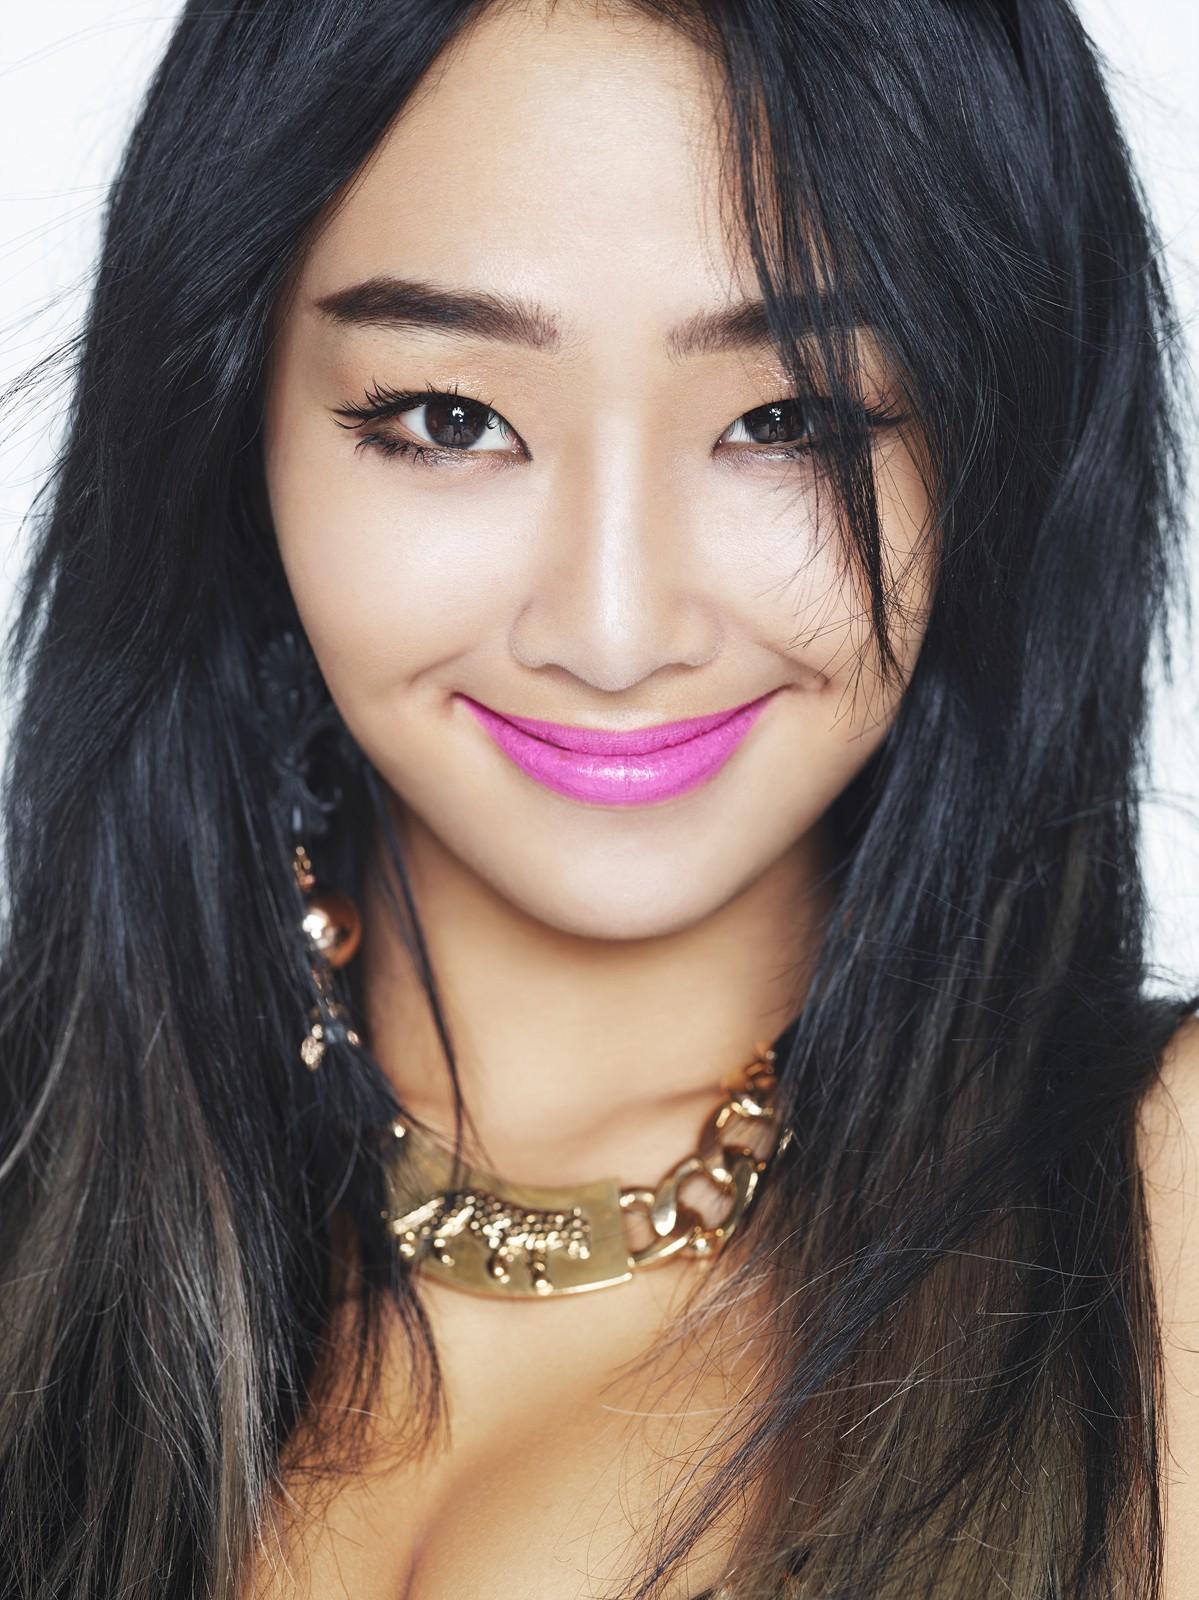 Sistar - K-Pop - Asiachan KPOP Image Board Hyorin Sistar